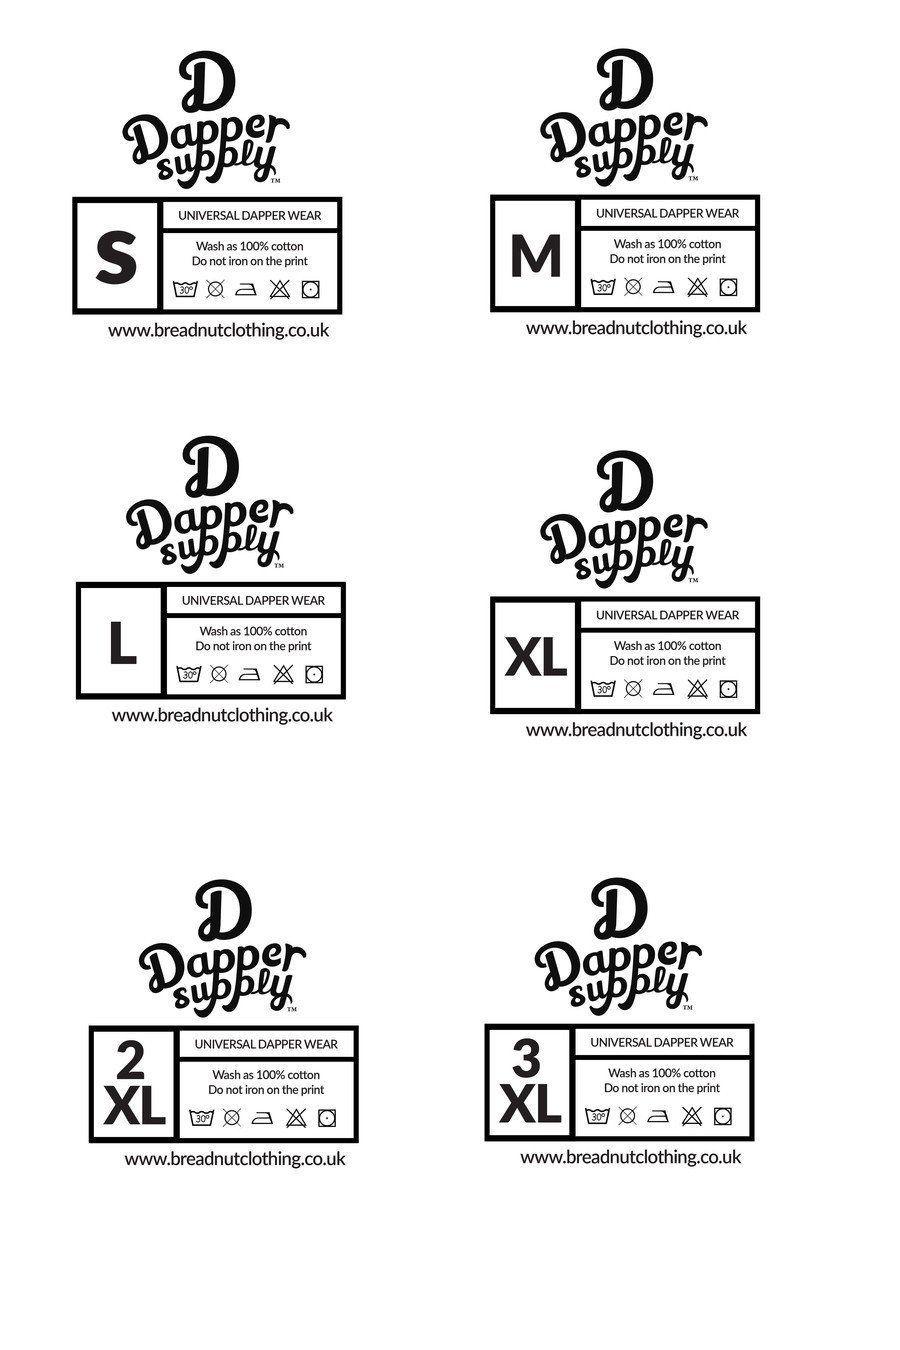 007 Fantastic Free Clothing Label Design Template Sample  Templates DownloadFull